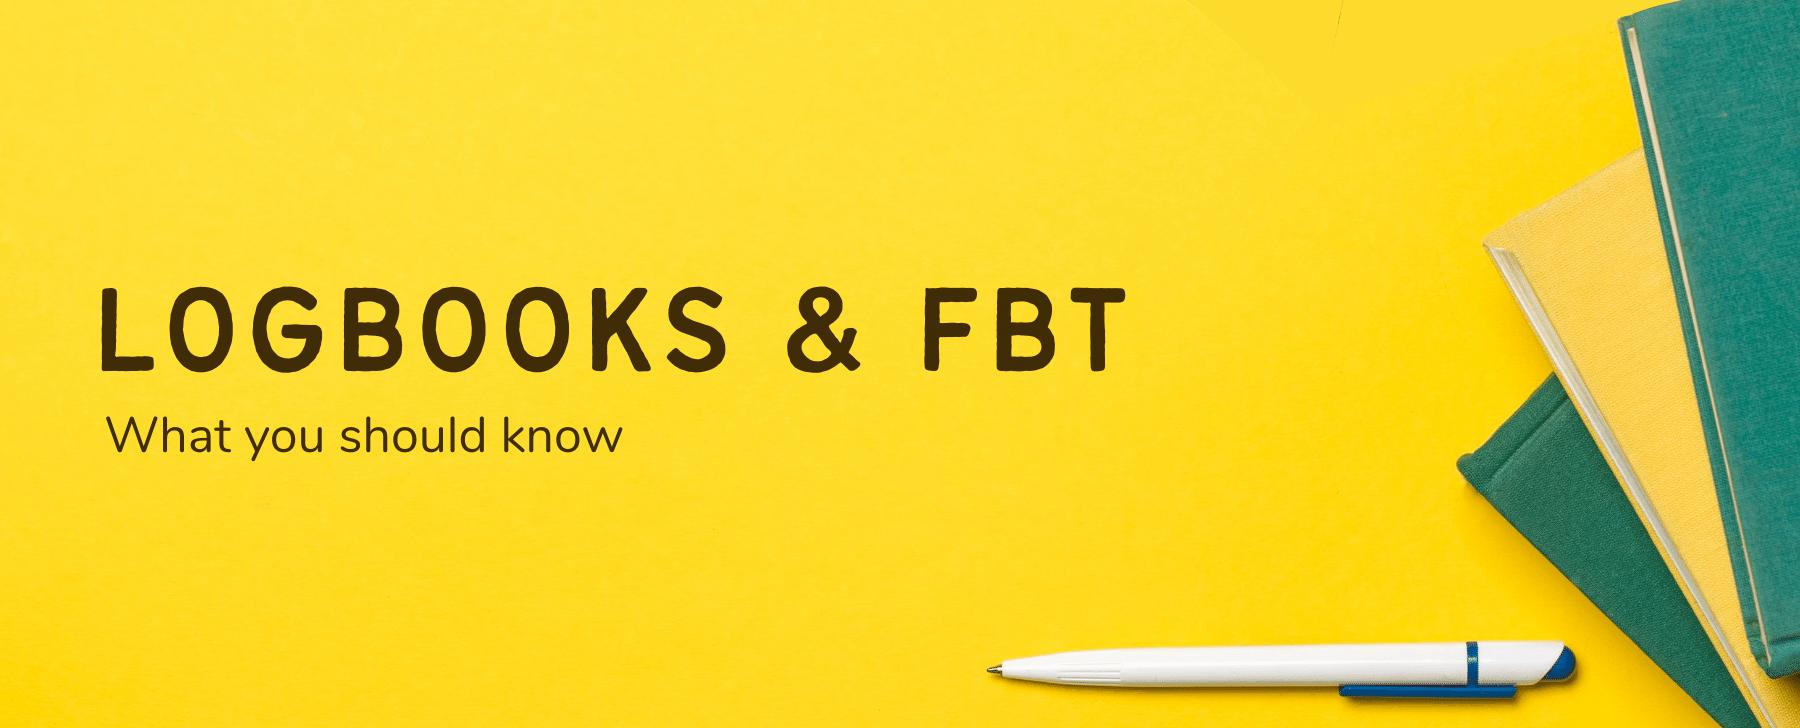 logbook and FBT